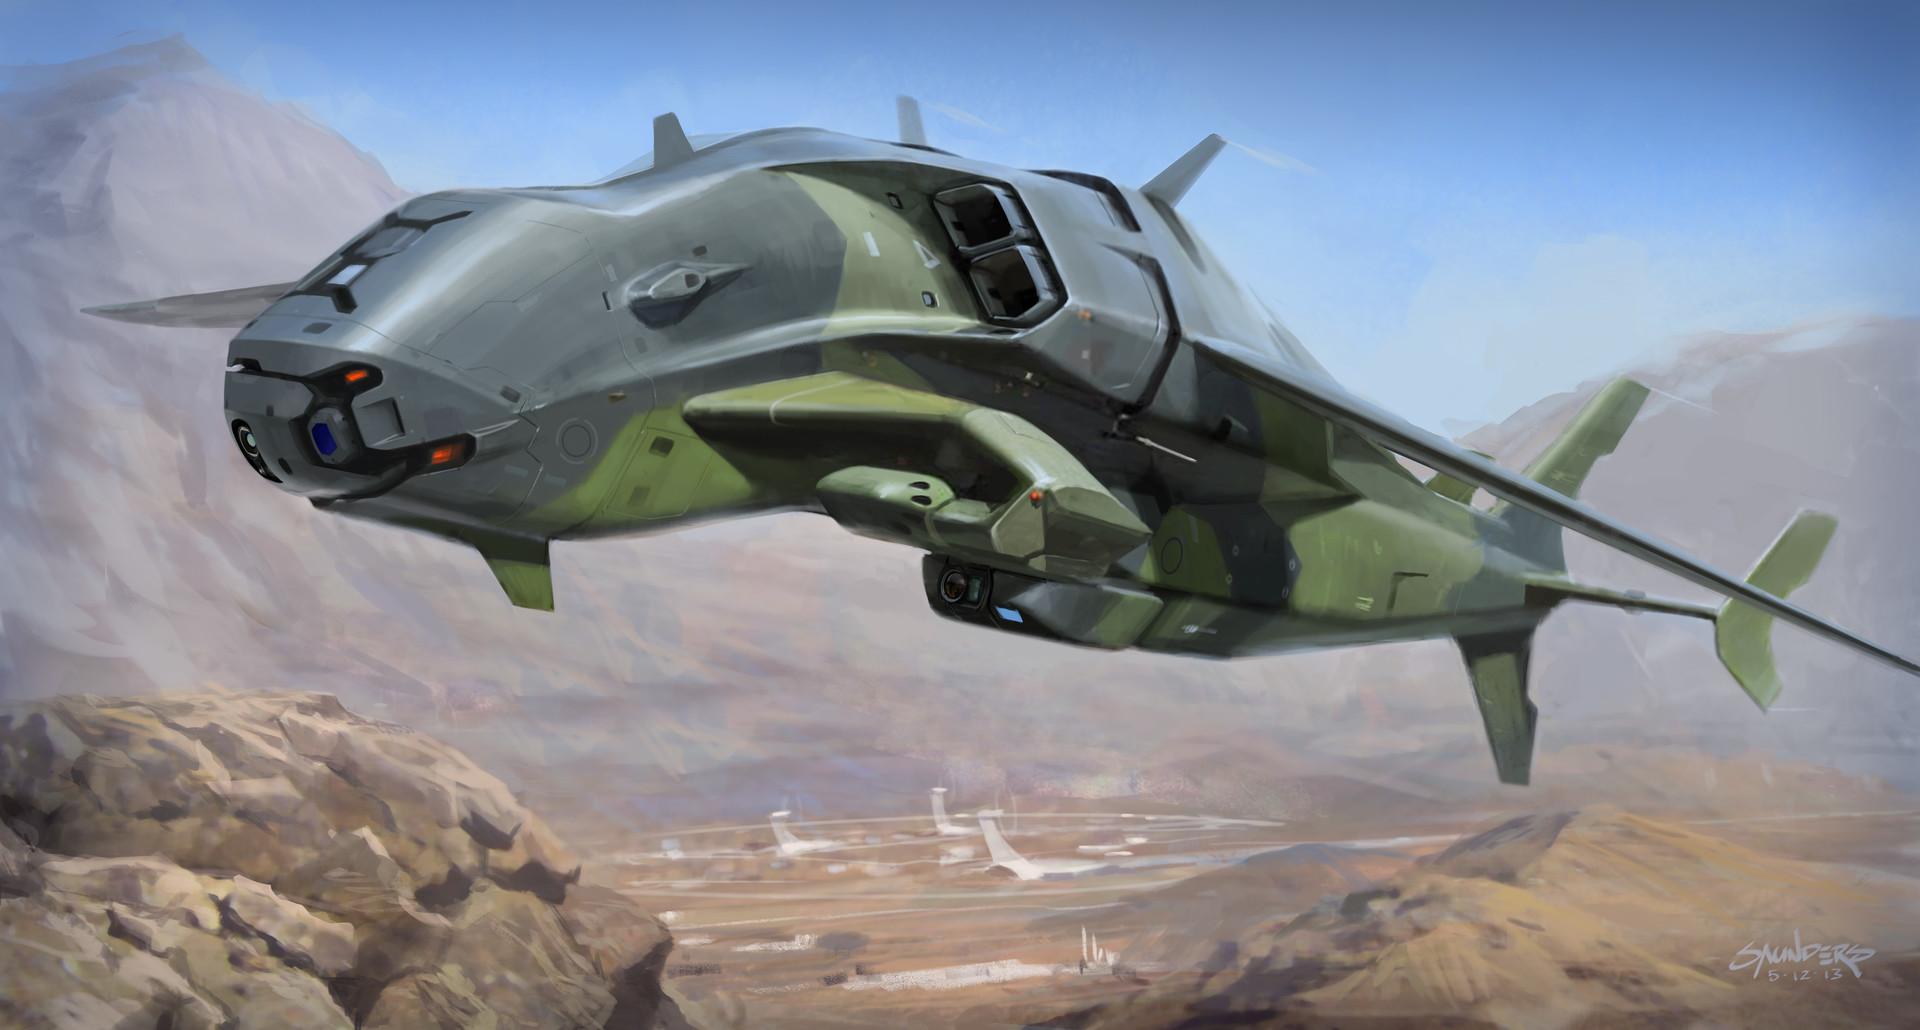 Phil saunders drone 001